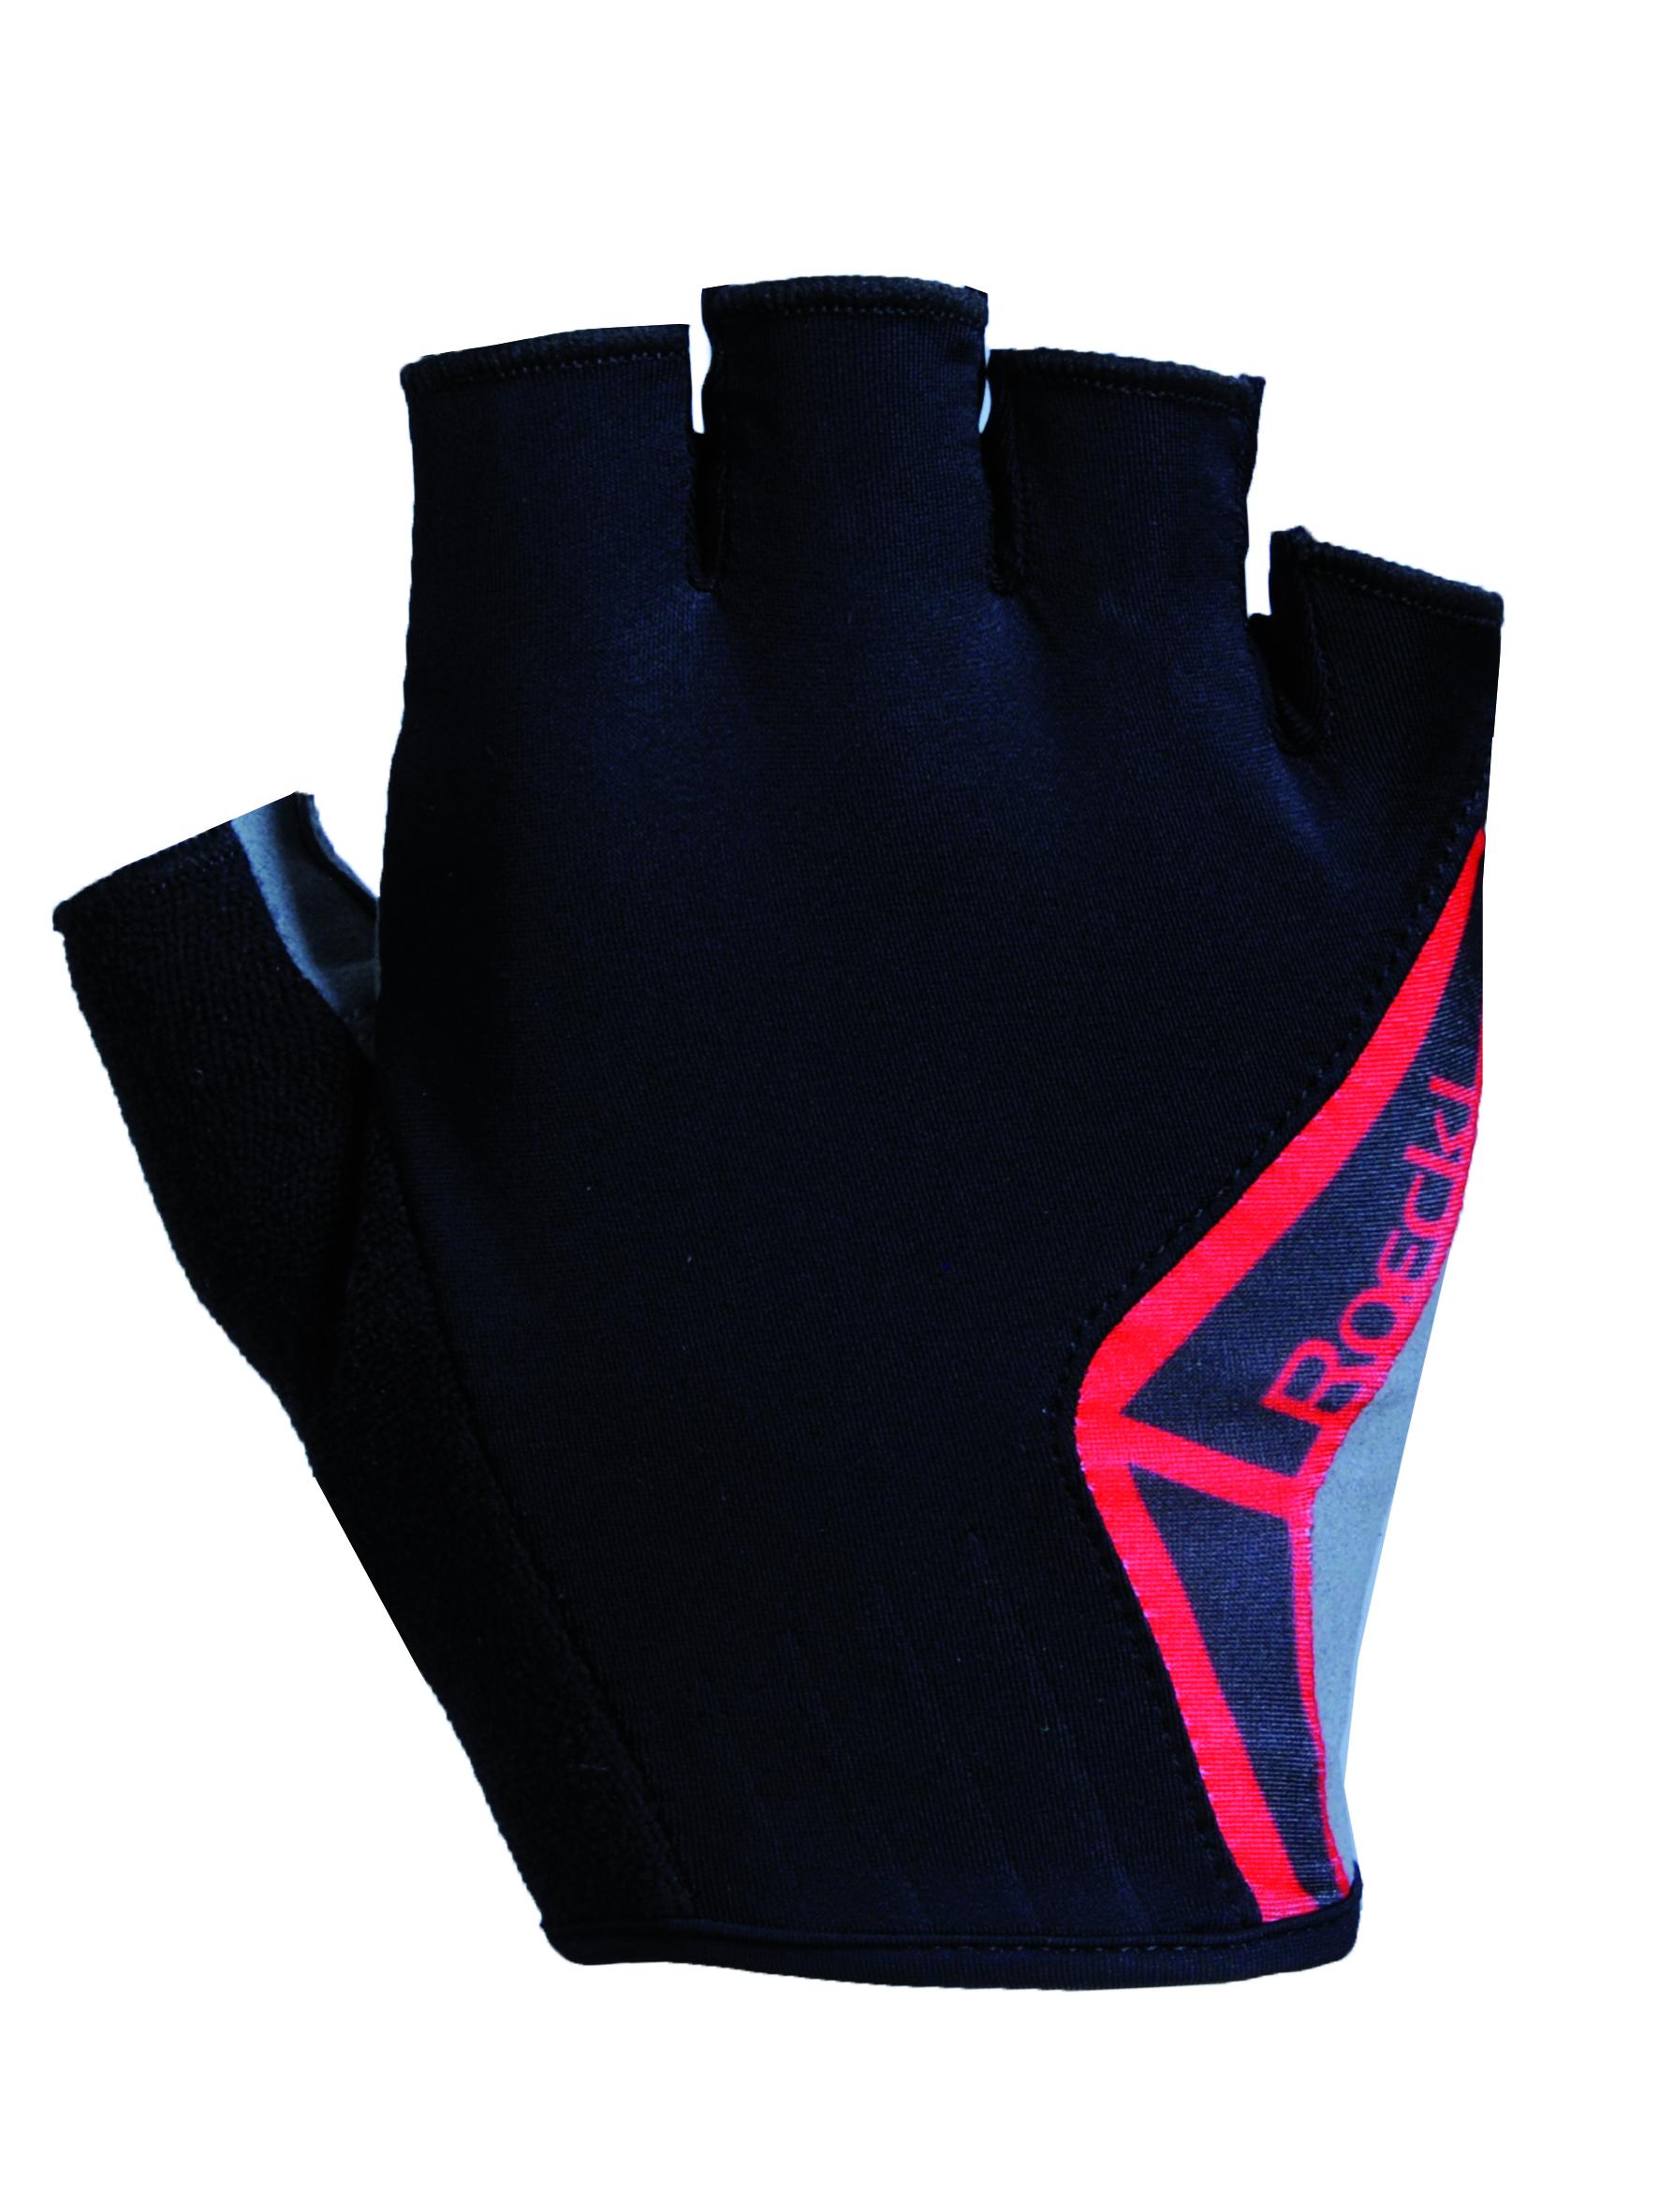 3101-367-004 Biel?_black/red